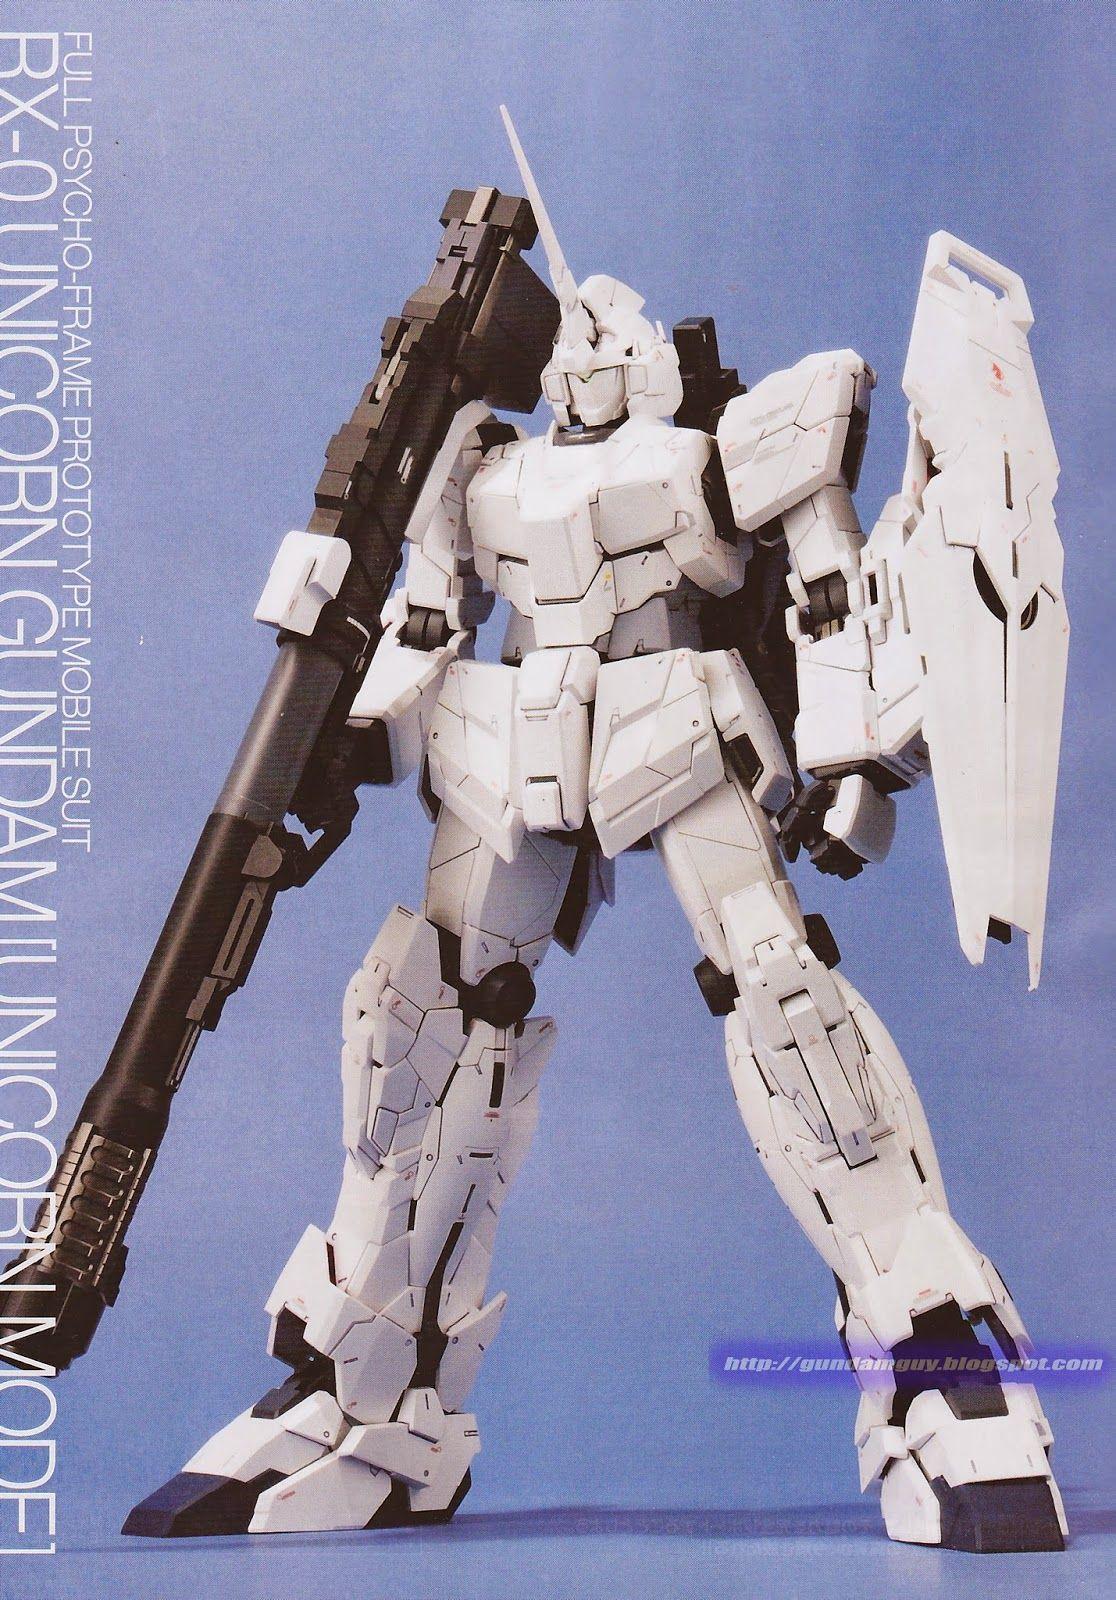 GUNDAM GUY: PG 1/60 RX-0 Unicorn Gundam - New Images, Videos